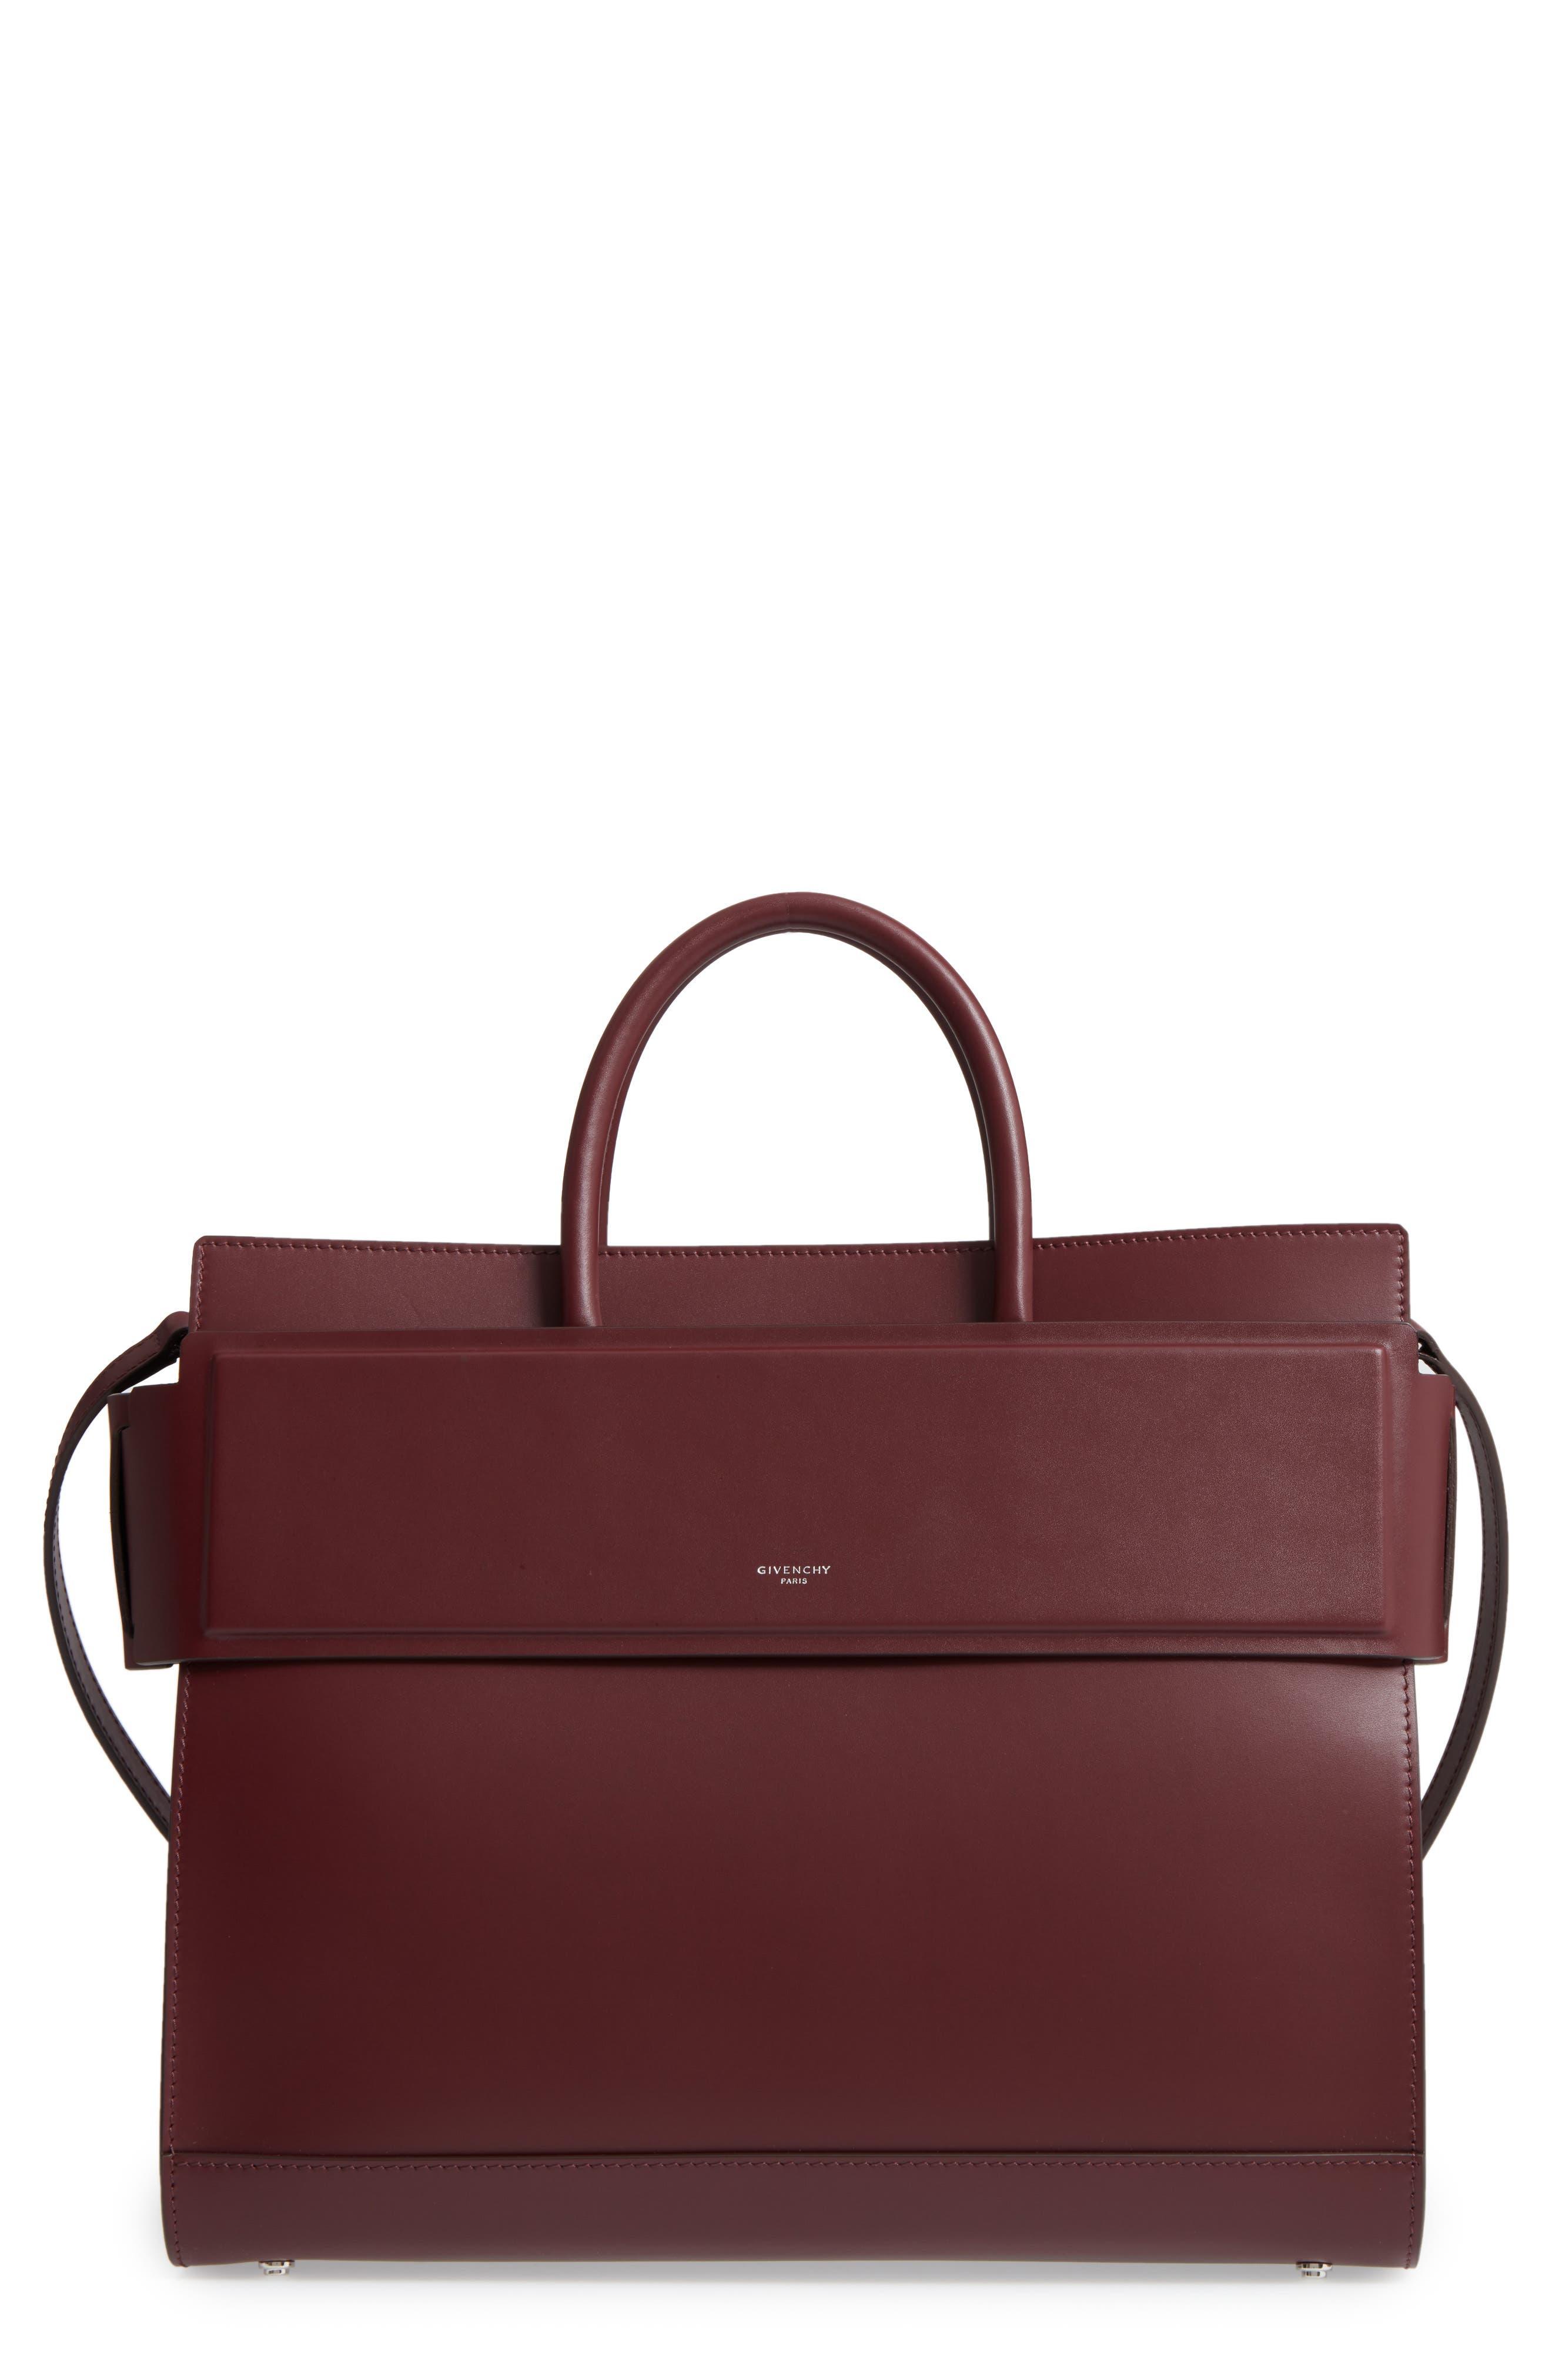 Main Image - Givenchy Horizon Calfskin Leather Tote